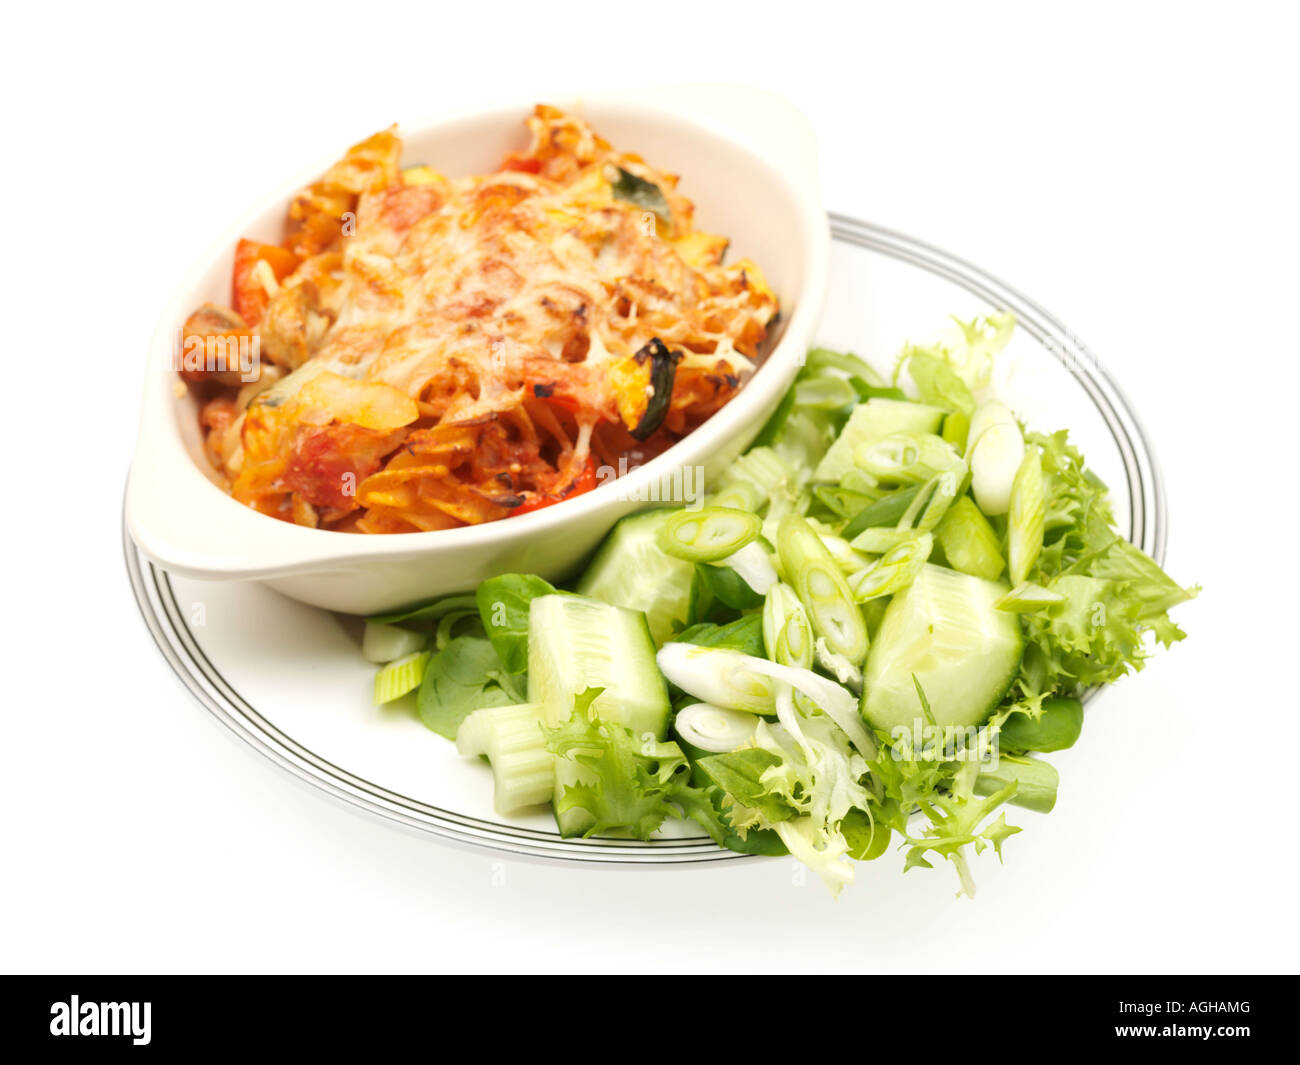 Tuna pasta bake with green salad stock photo royalty free for Tuna fish pasta salad